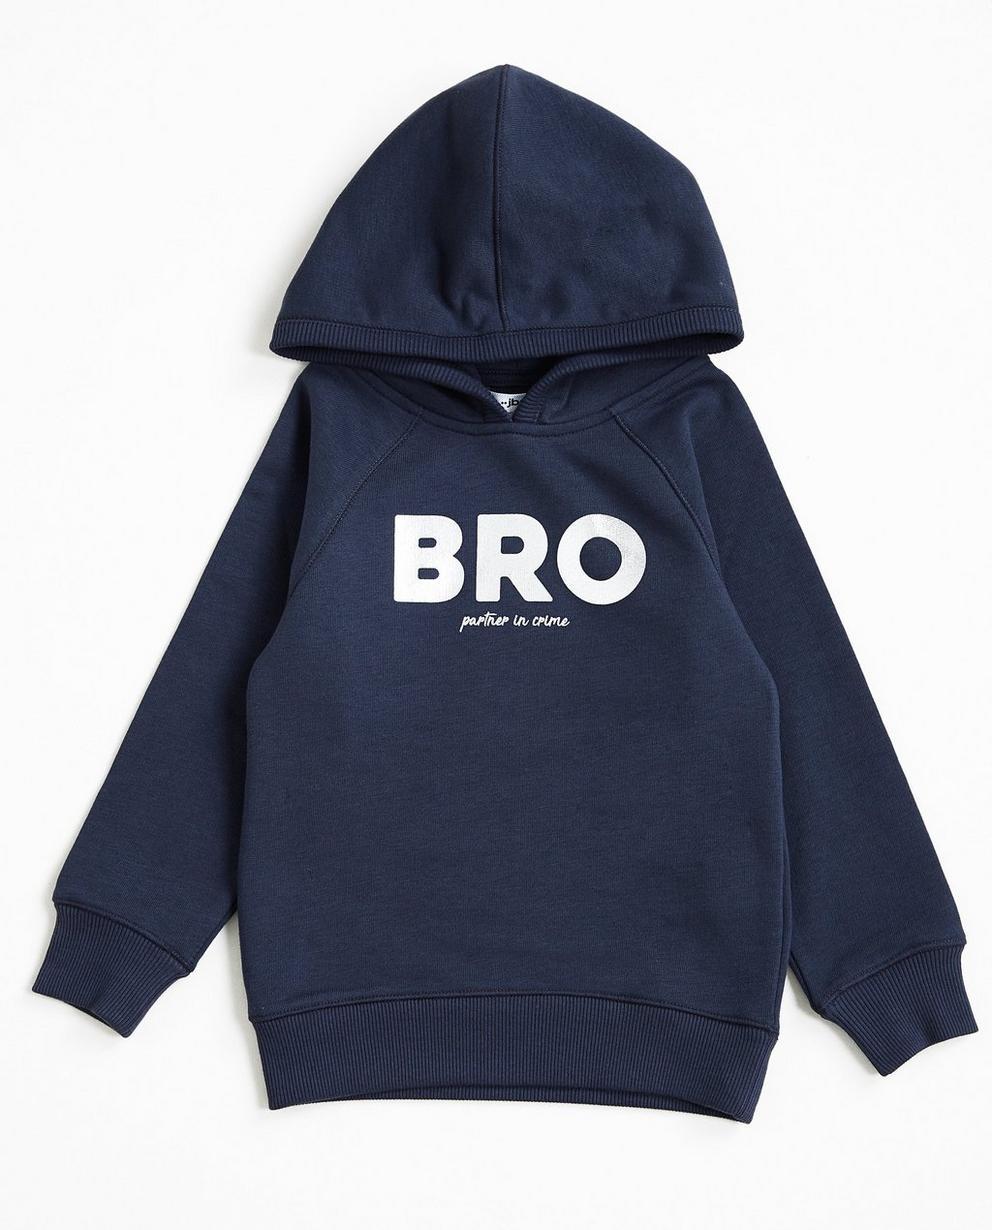 Nachtblauwe hoodie - #familystoriesjbc - JBC